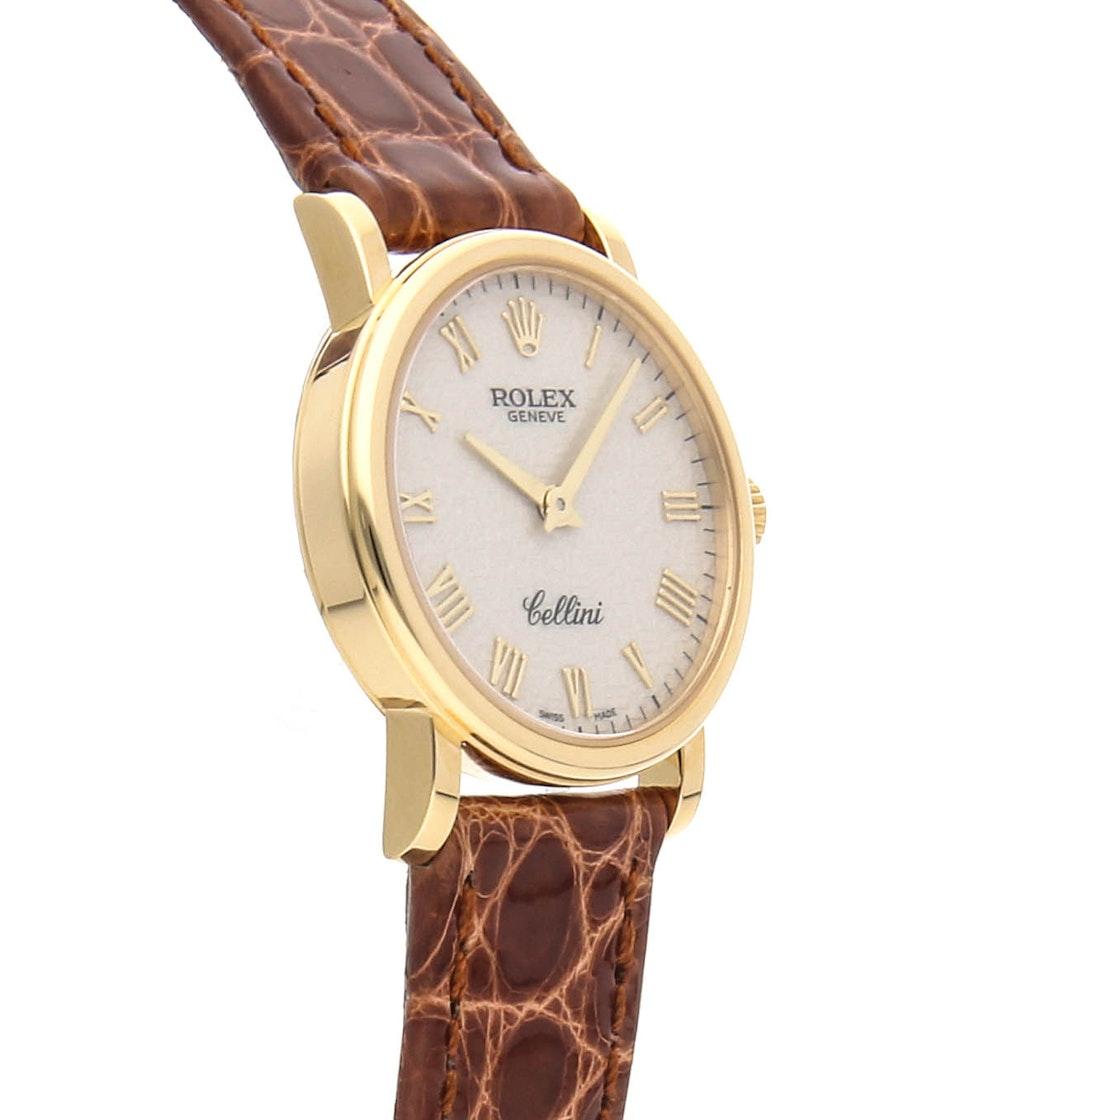 Rolex Cellini 6110/8